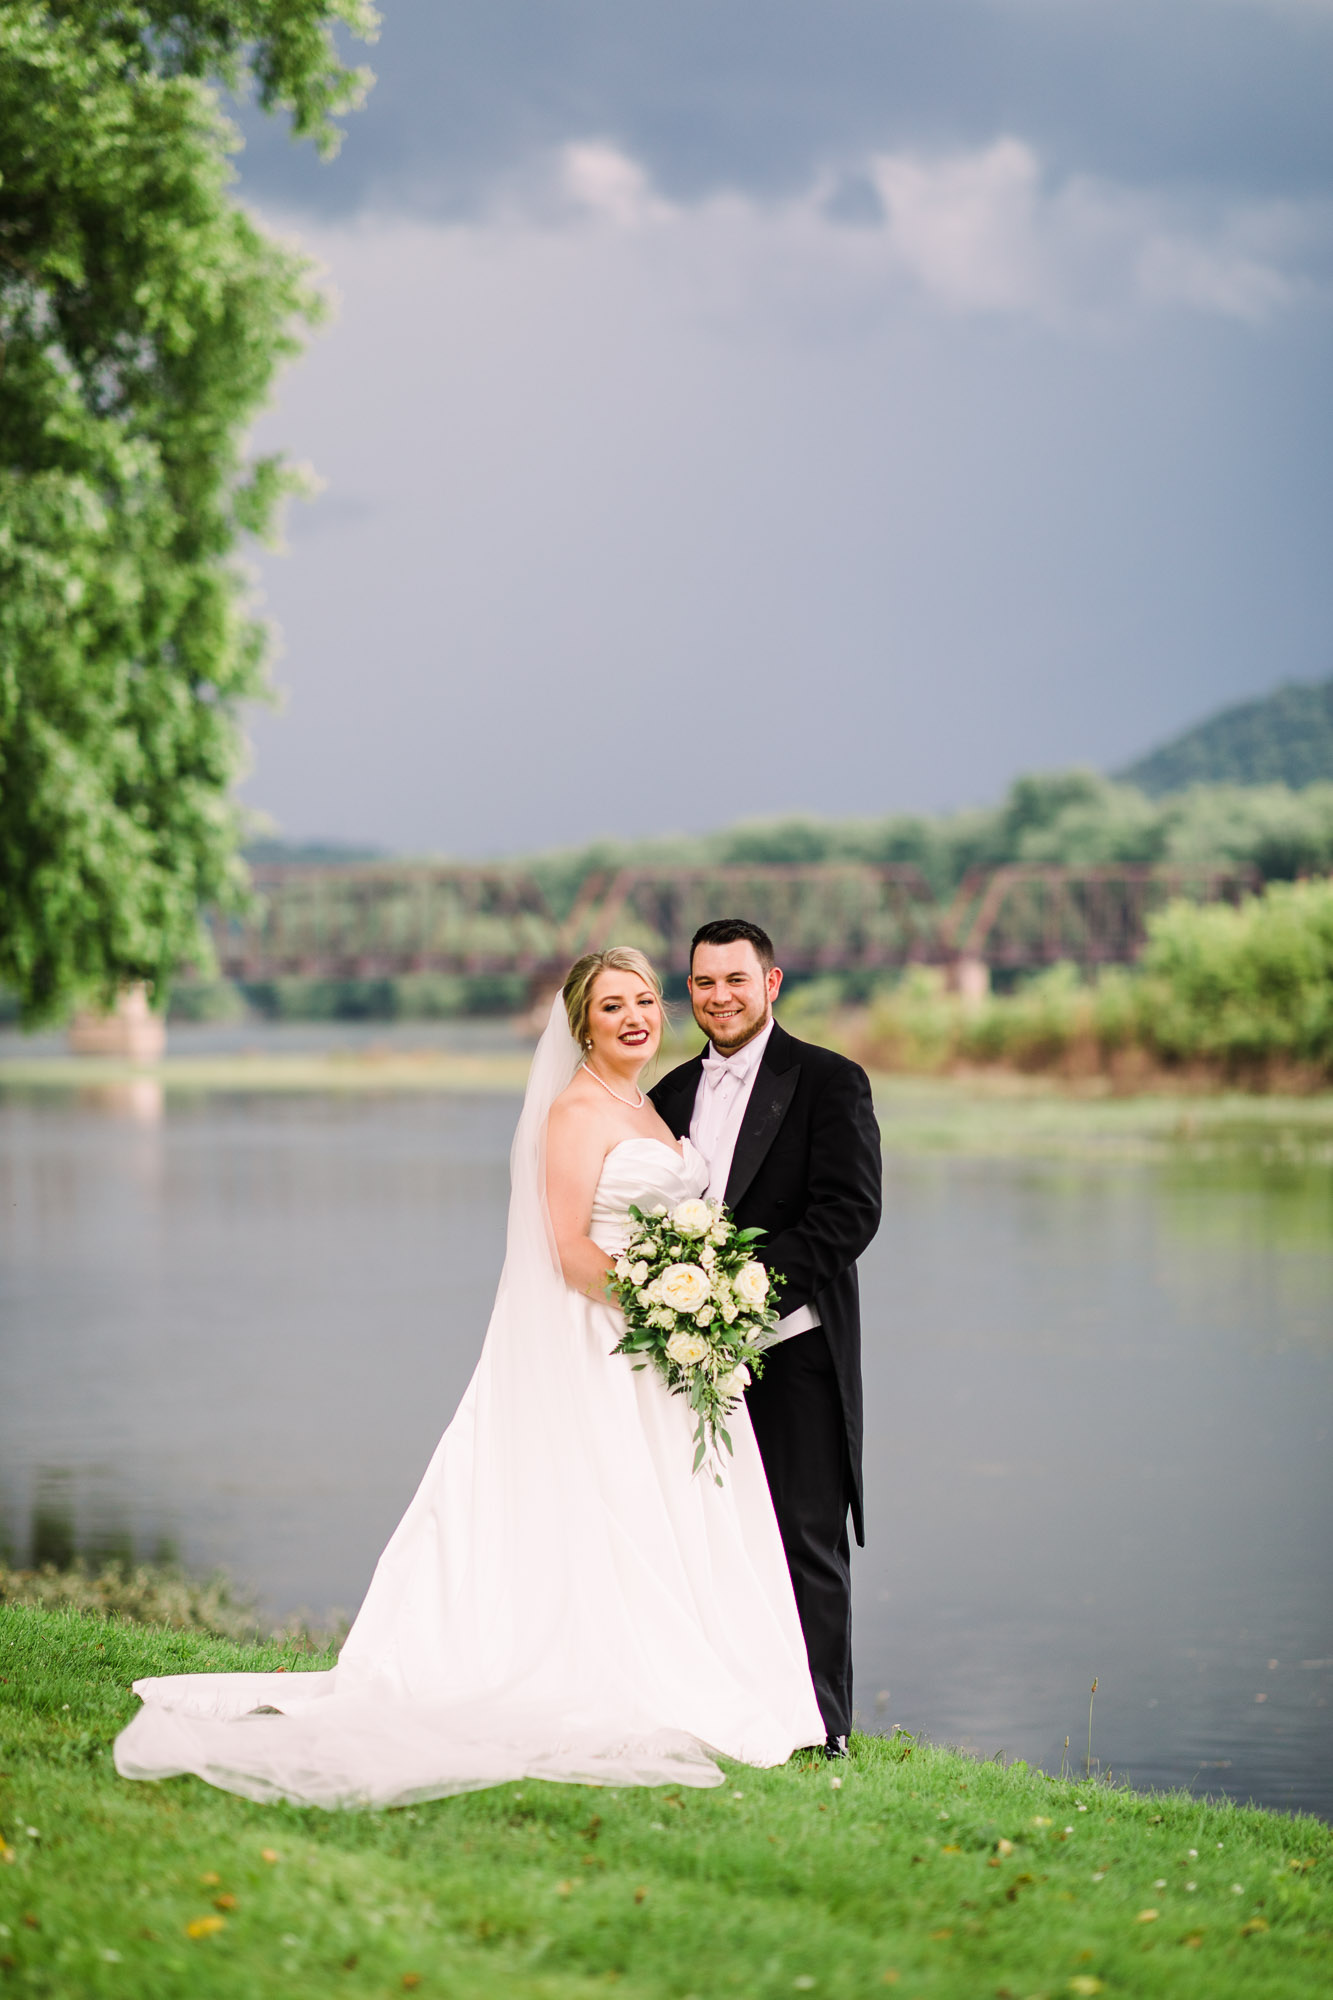 isle-of-que-wedding-4129.jpg